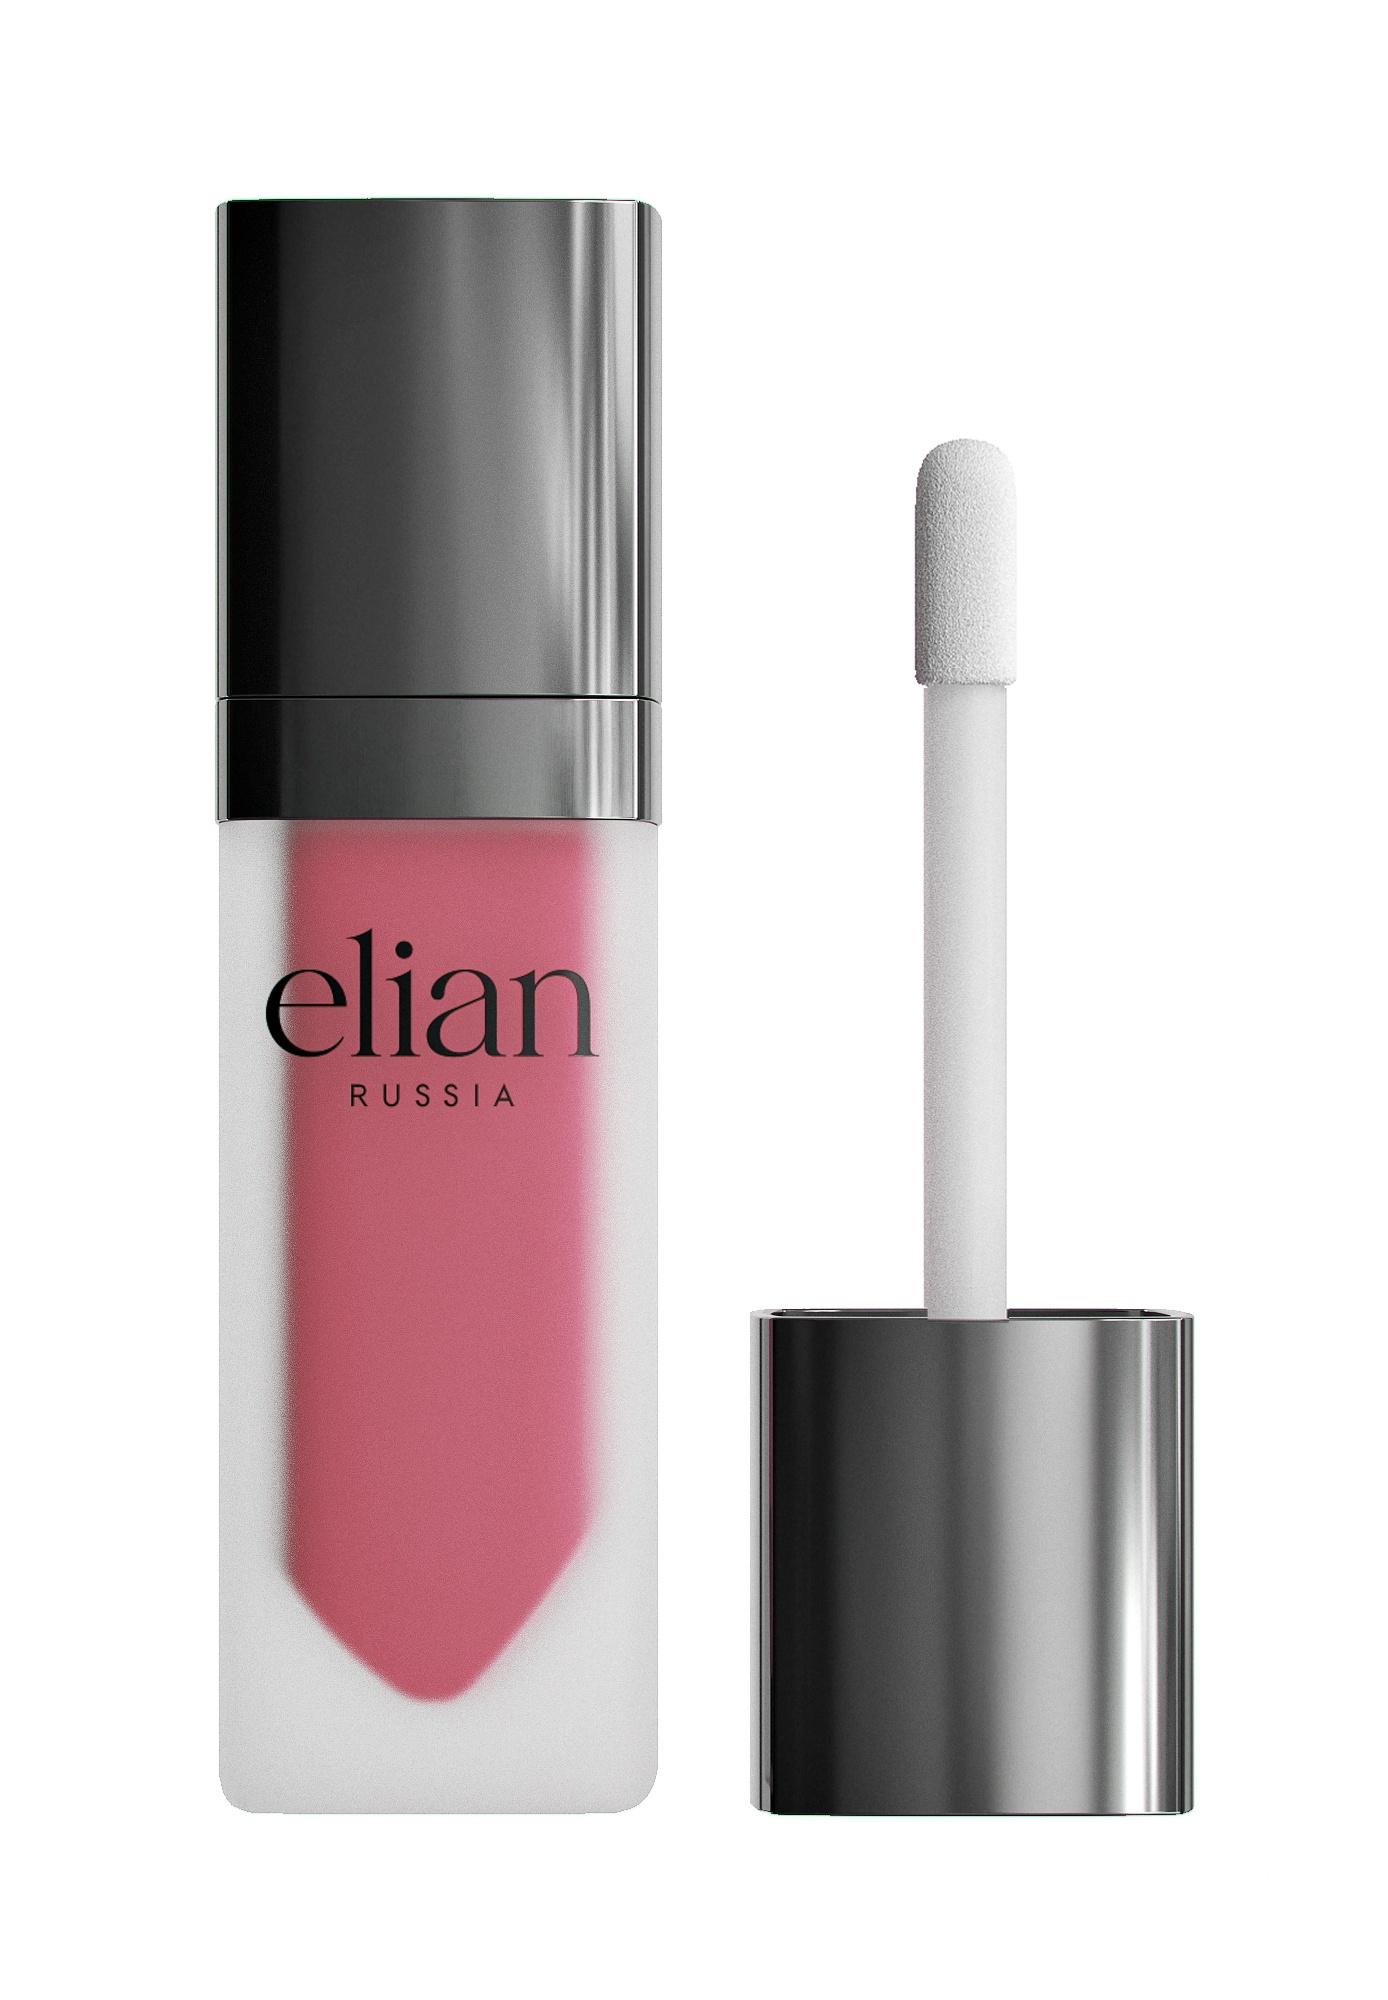 Жидкая матовая помада Superior matte liquid lipstick 509 Firebird ELIAN RUSSIA цена